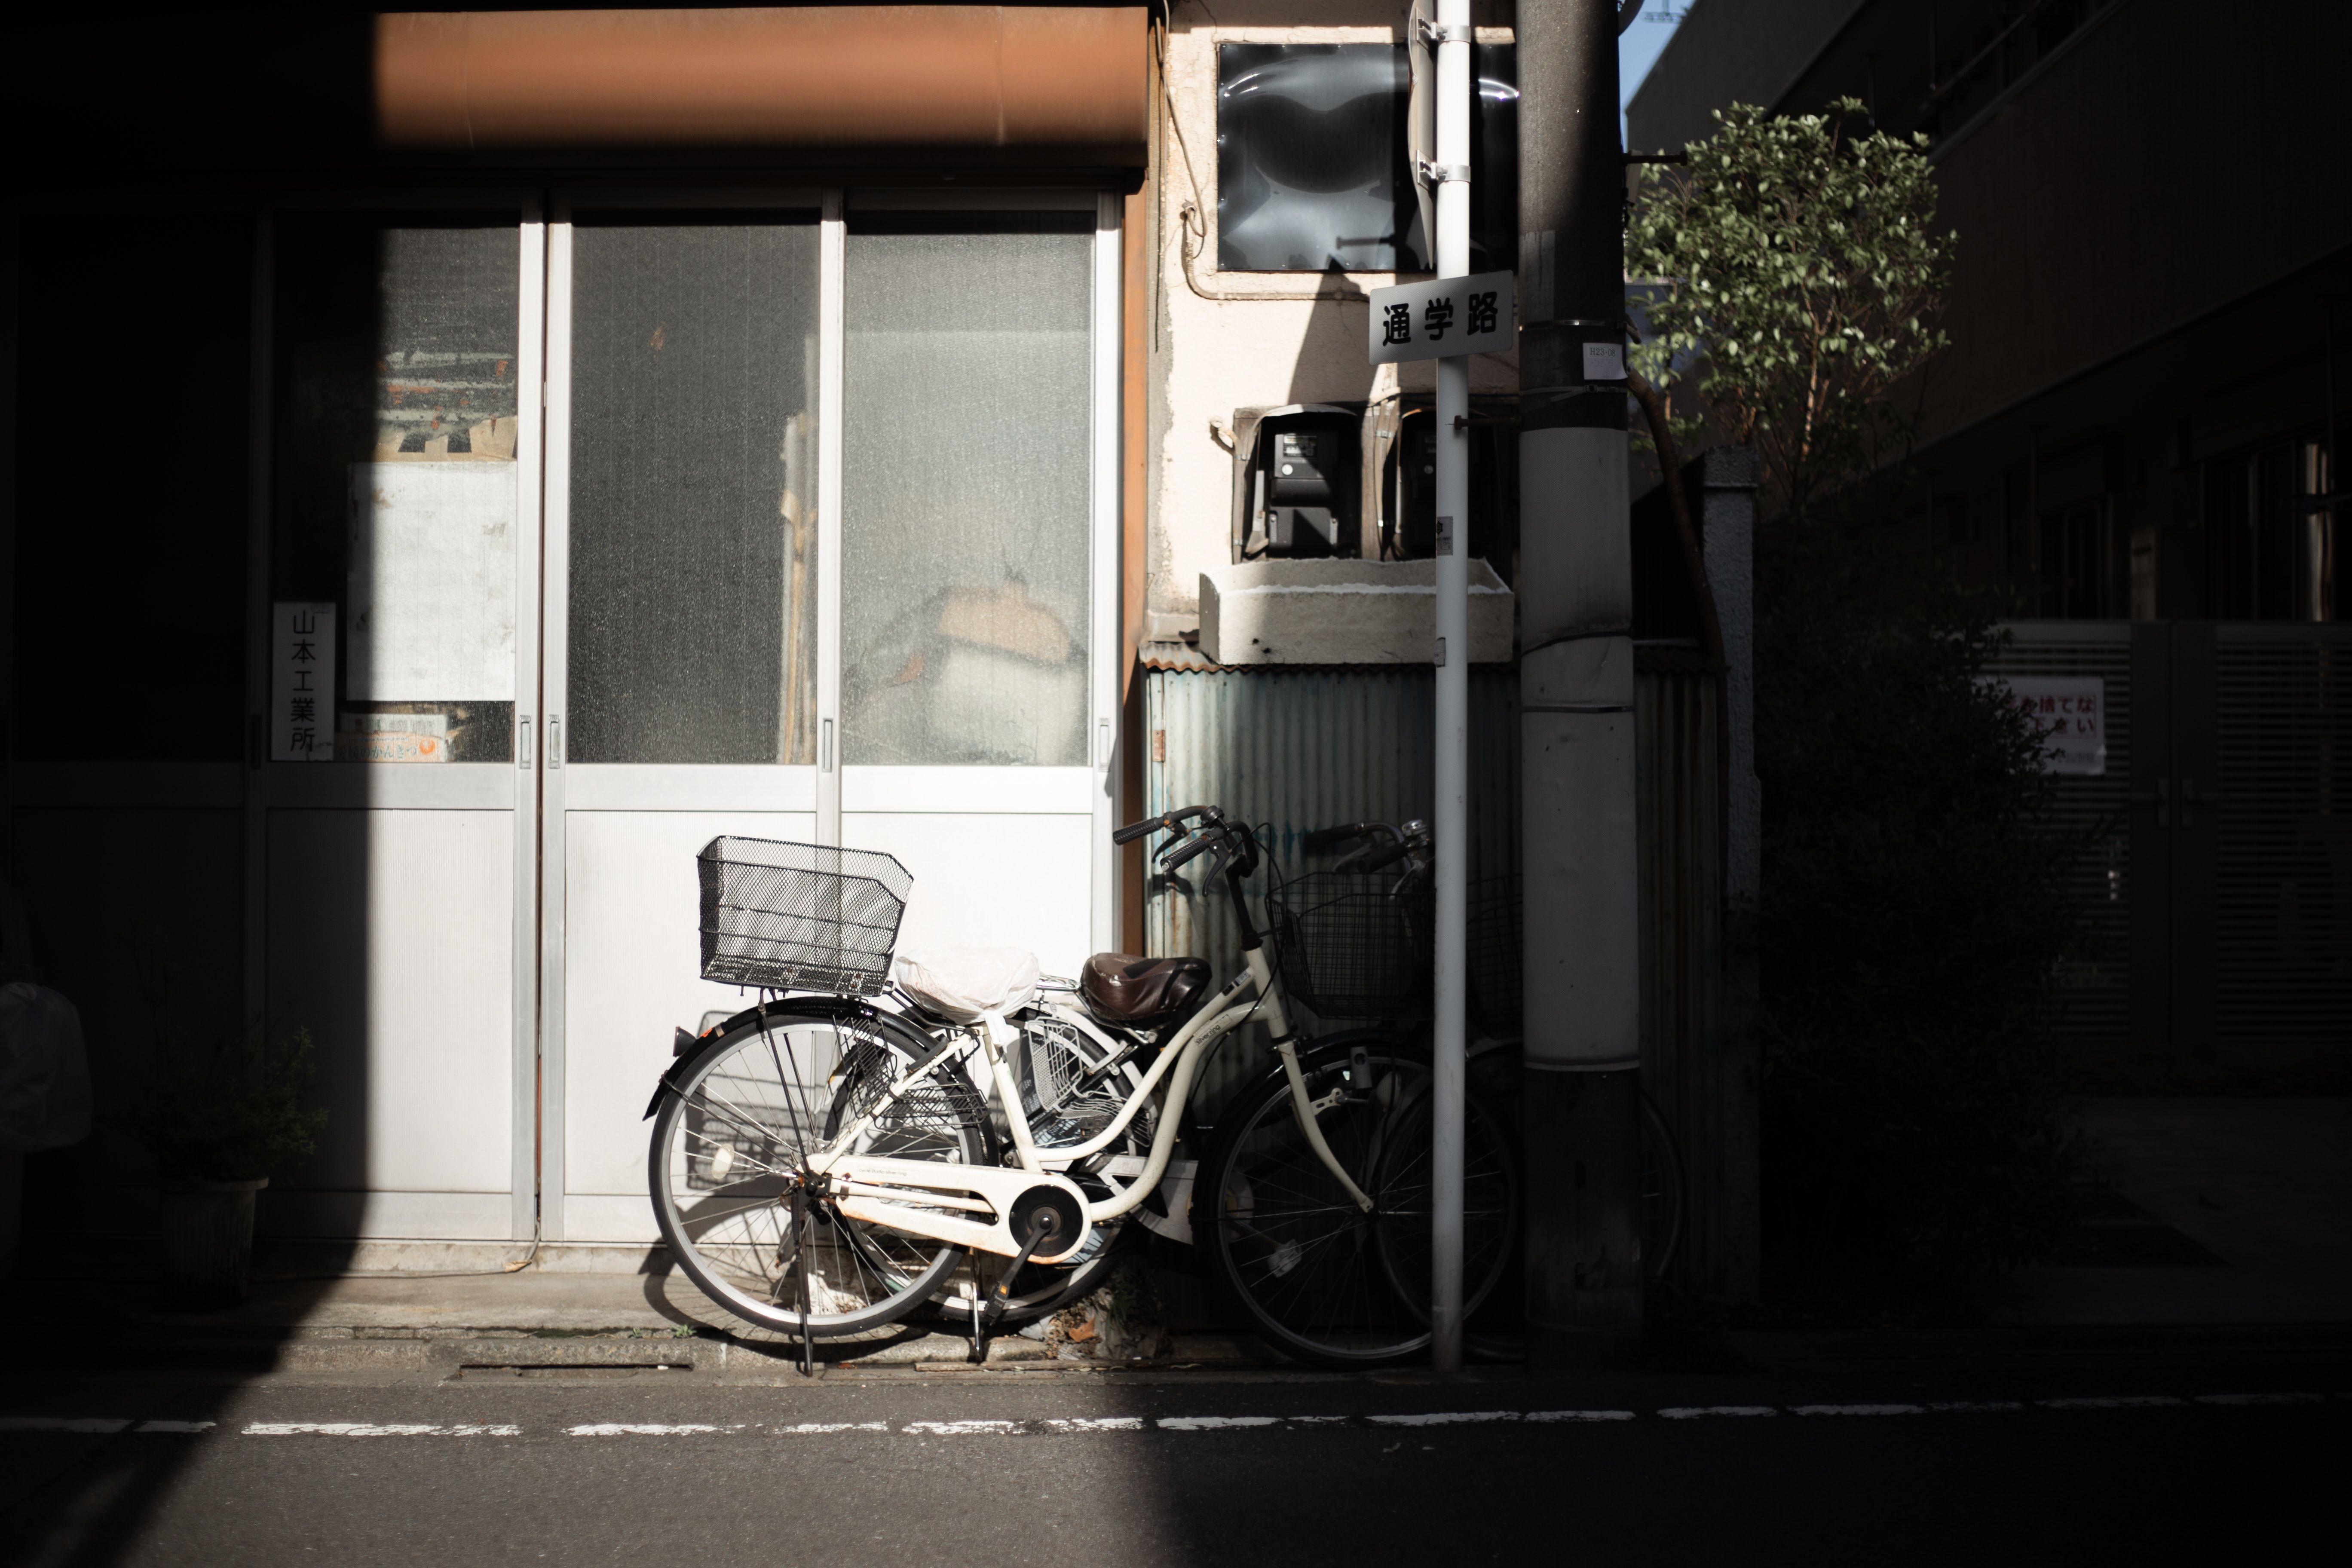 Bike Bicycle Vehicle White Bicycle Parked White Bicycle